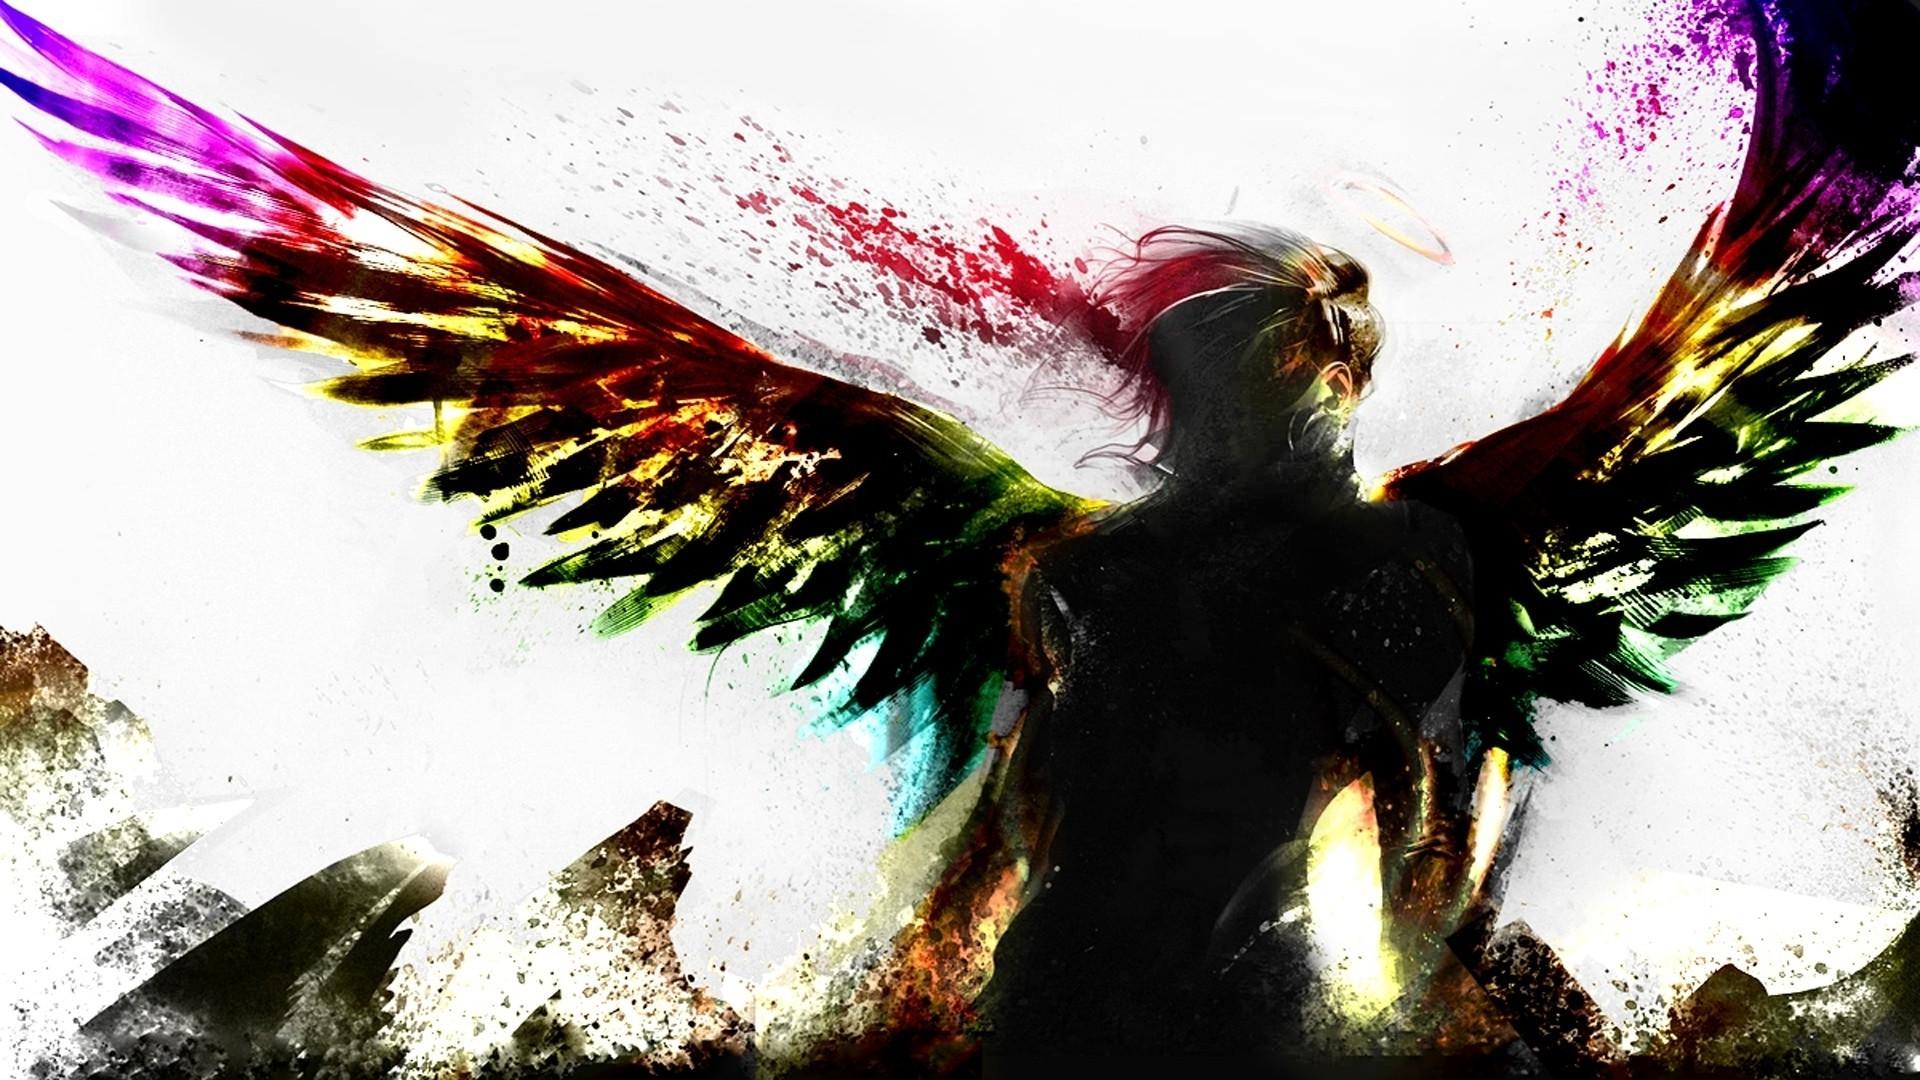 Colorful Illustration Digital Art Fantasy Wings Angel Artwork Bird Wing 1920x1080 Px Fictional Character